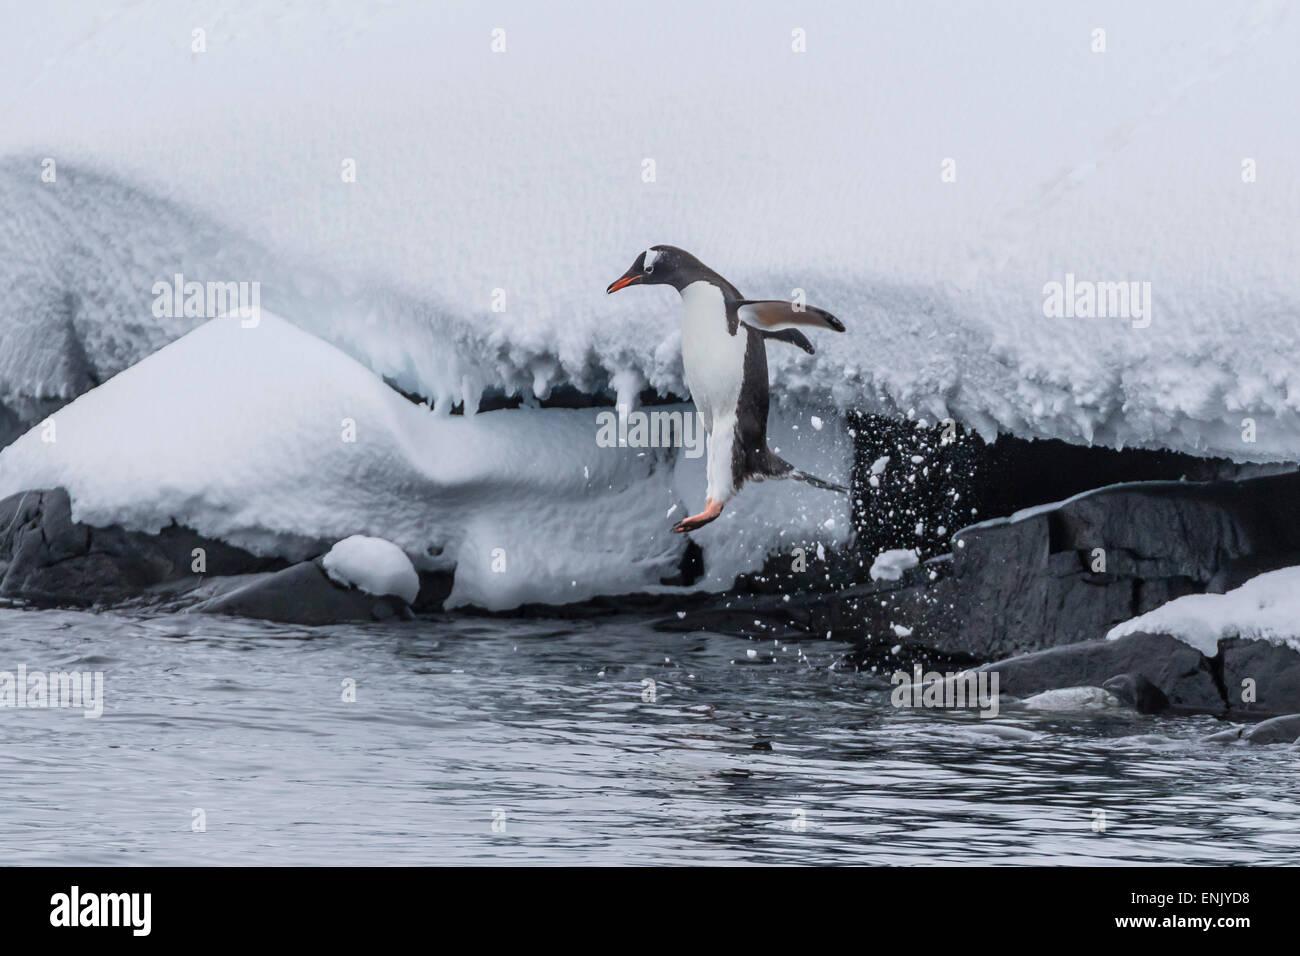 Gentoo penguin (Pygoscelis papua) leaping into the sea at Booth Island, Antarctica, Polar Regions - Stock Image